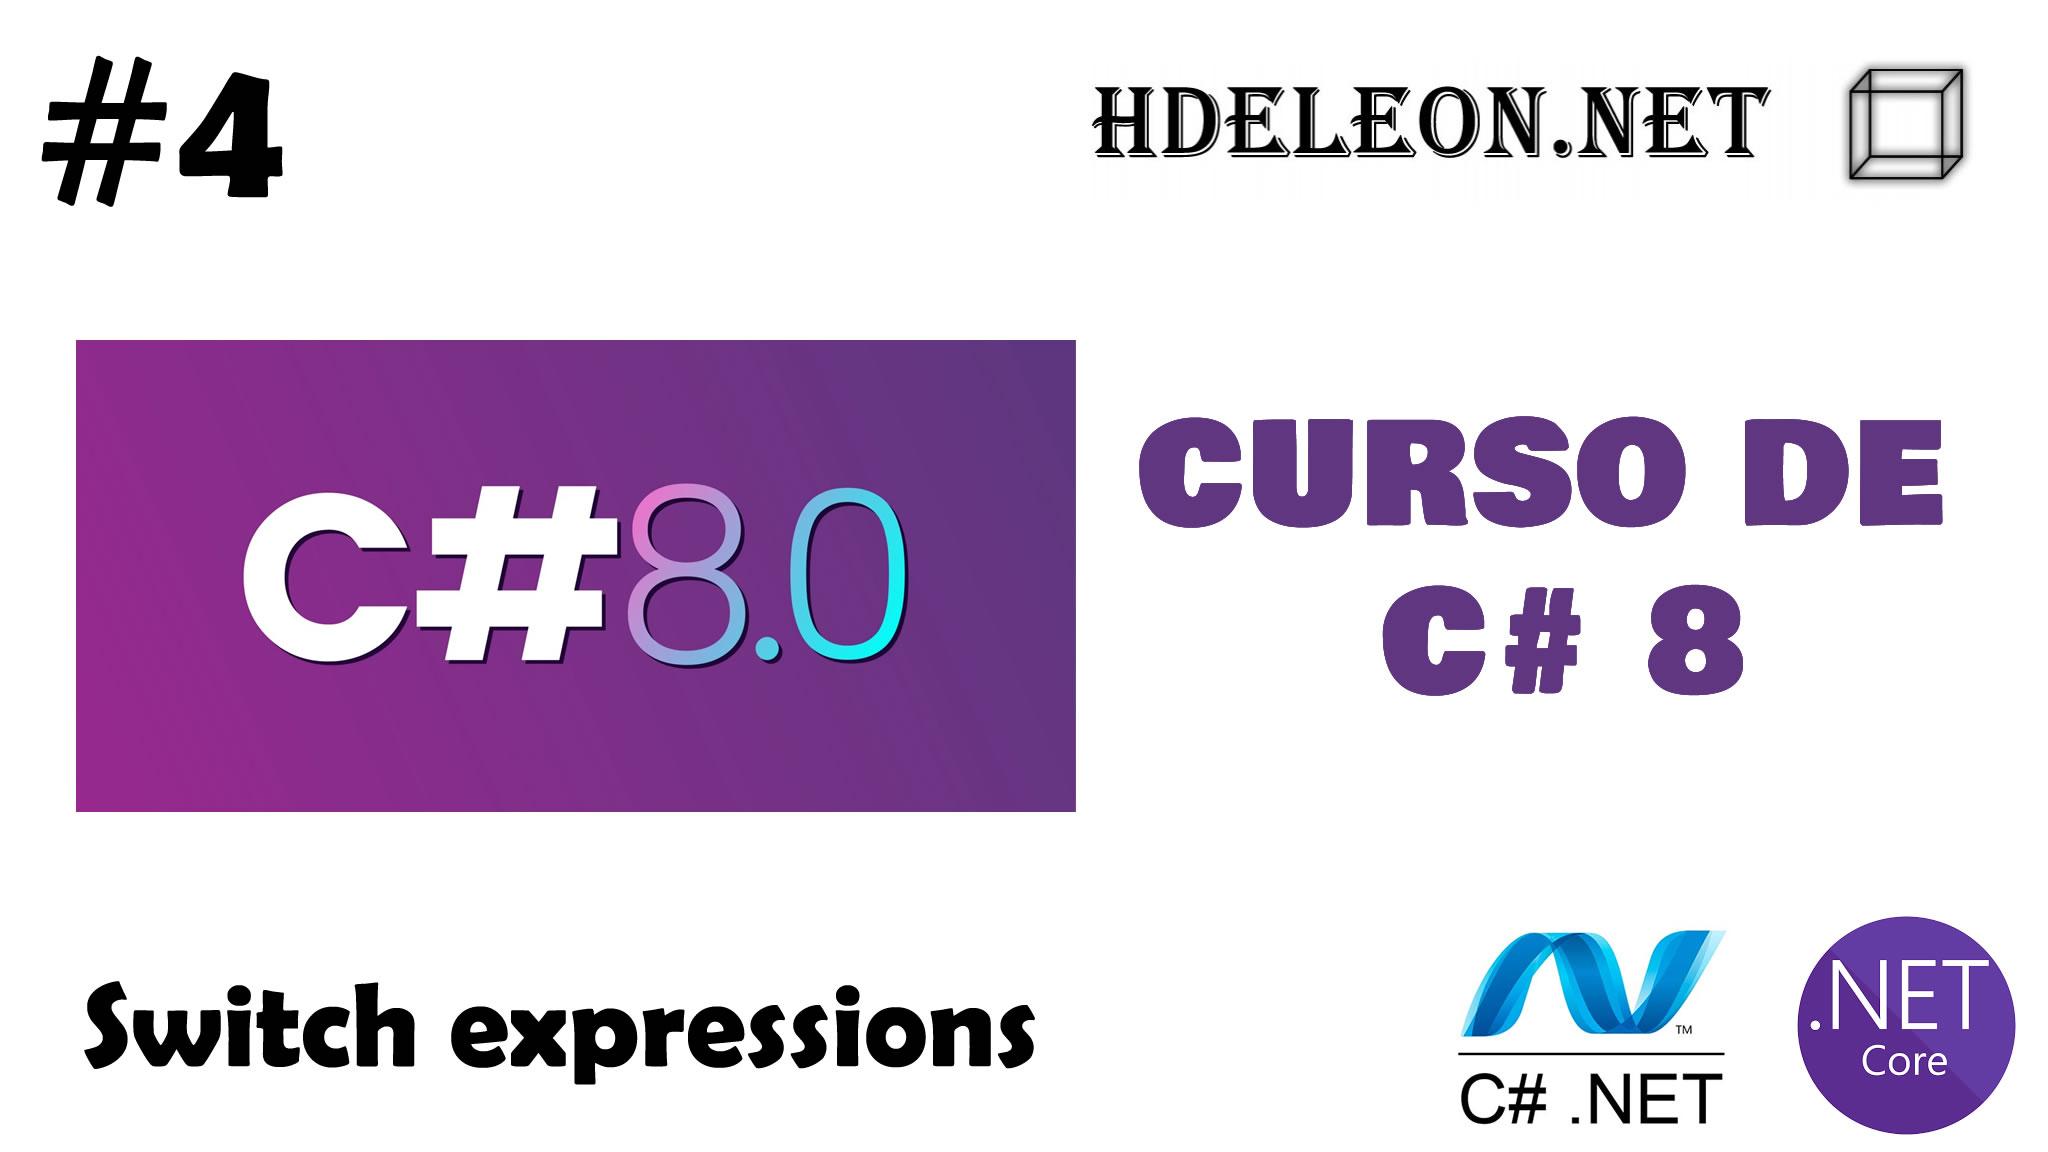 Curso gratuito de C# 8 .Net, Switch expressions, #4